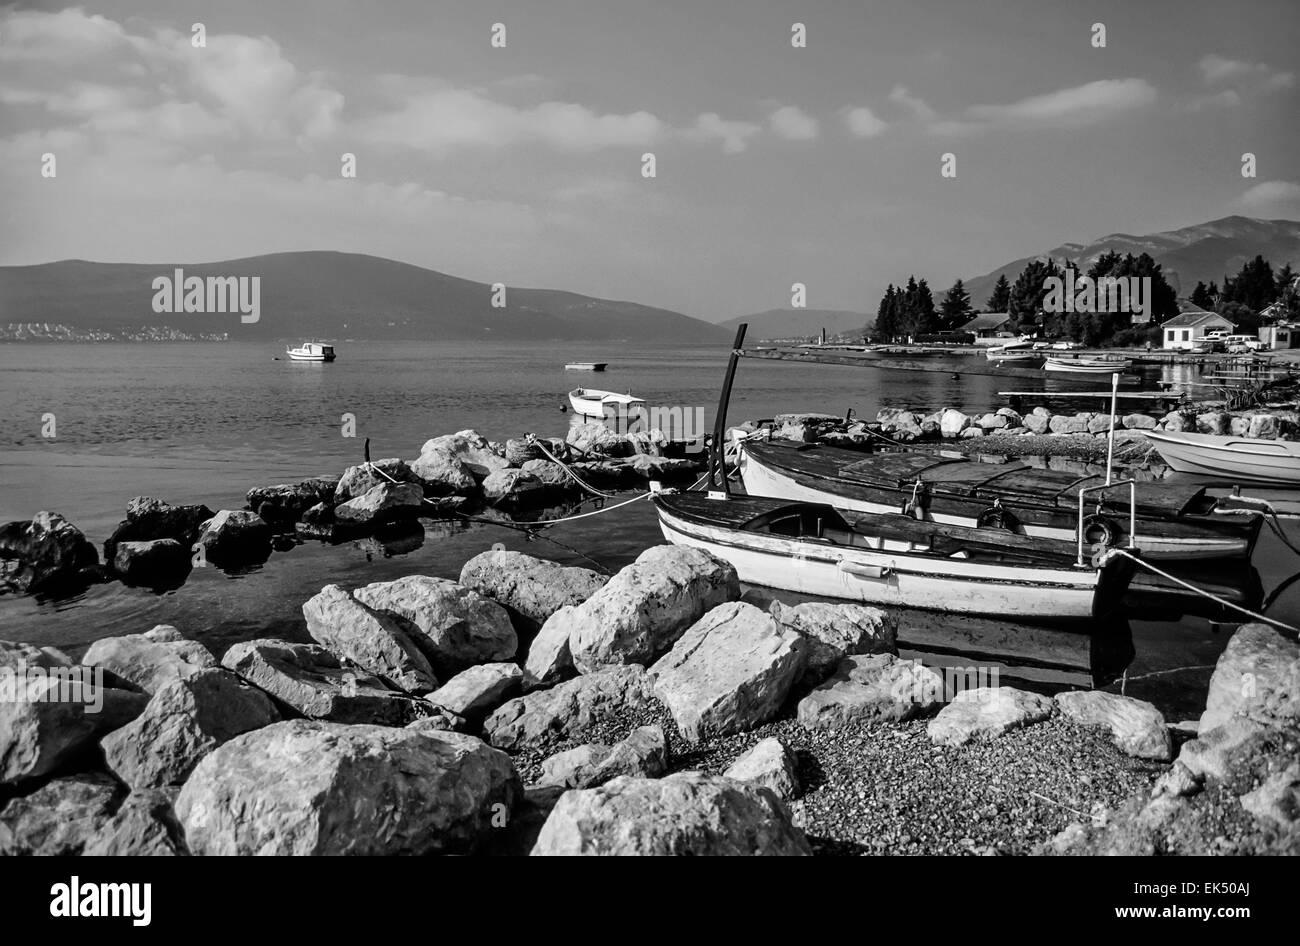 Montenegro, Adriatic Sea, view of the coastline near Sveti Stefan Island - FILM SCAN - Stock Image